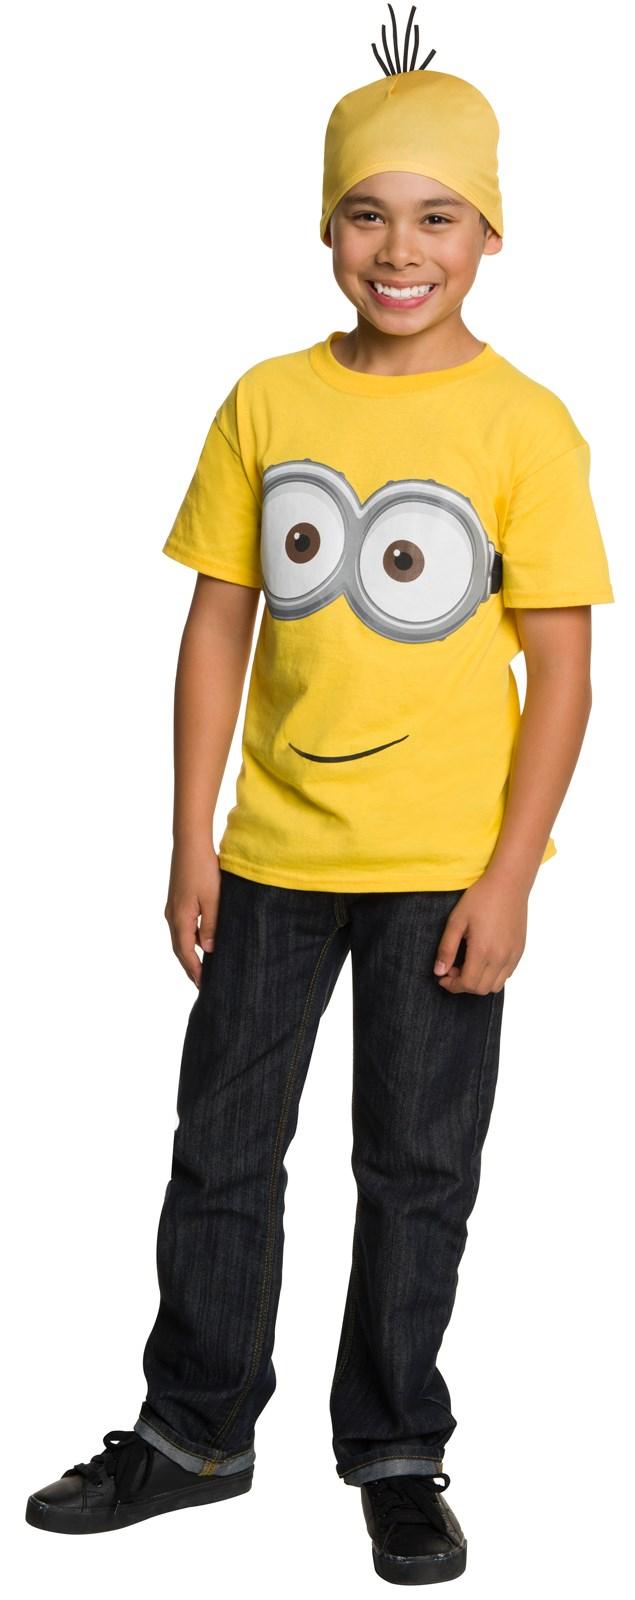 Minions Movie: Kids Minion T-Shirt & Headpiece